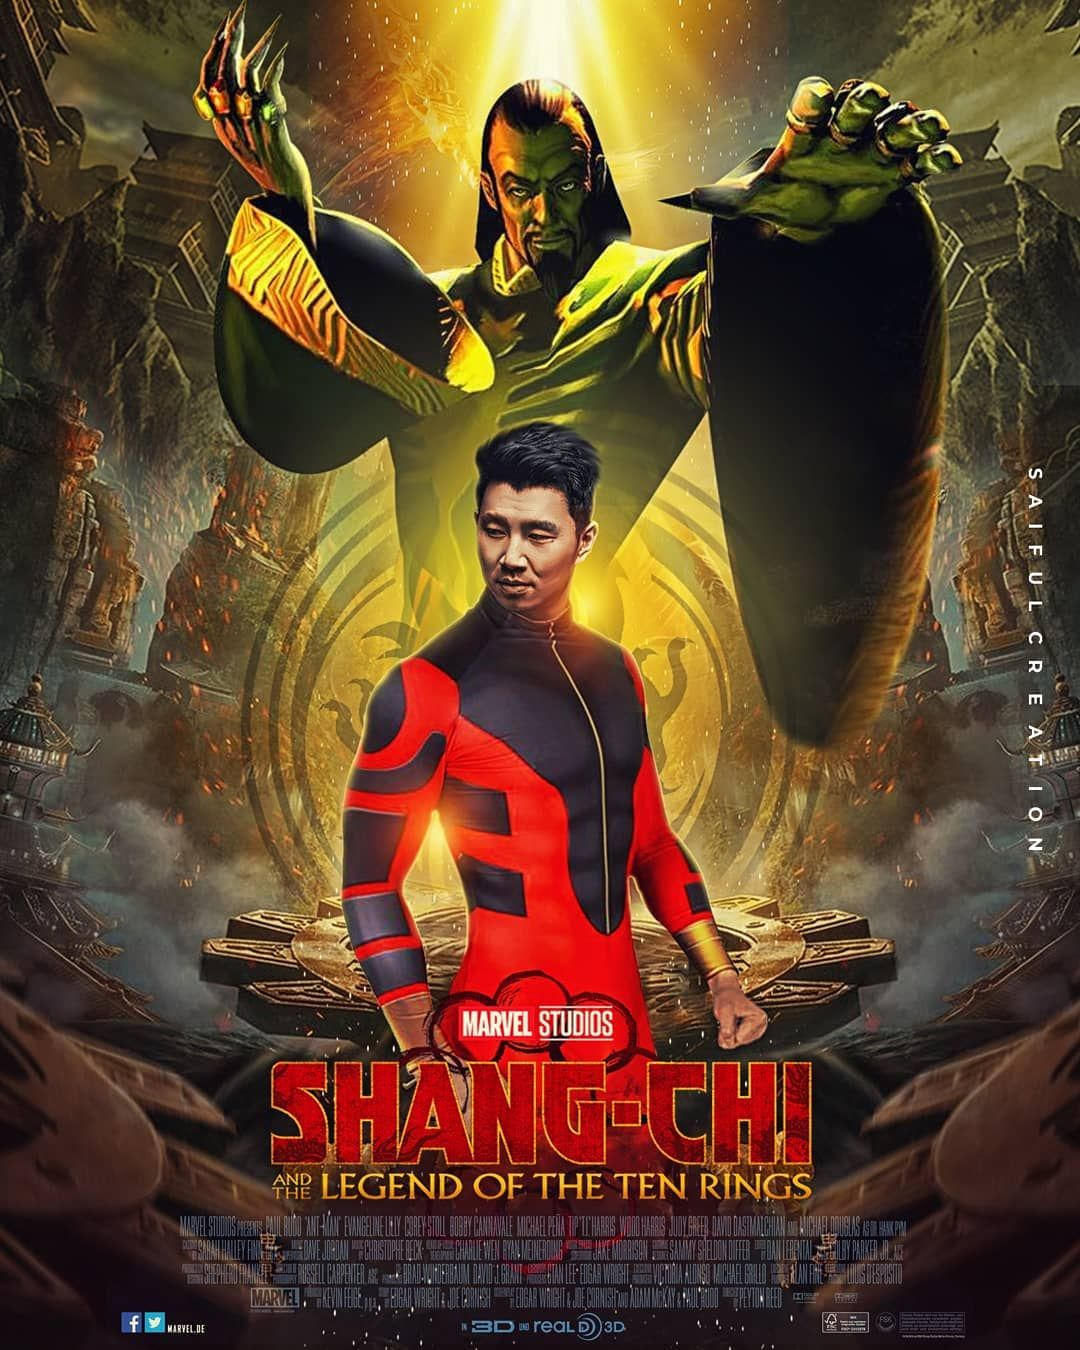 Polubienia 423 Komentarze 6 Saifulcreation Na Instagramie Simuliu Shang Chi The Legend Of Ten Rings This Mov Superhero Movies All Marvel Movies Marvel